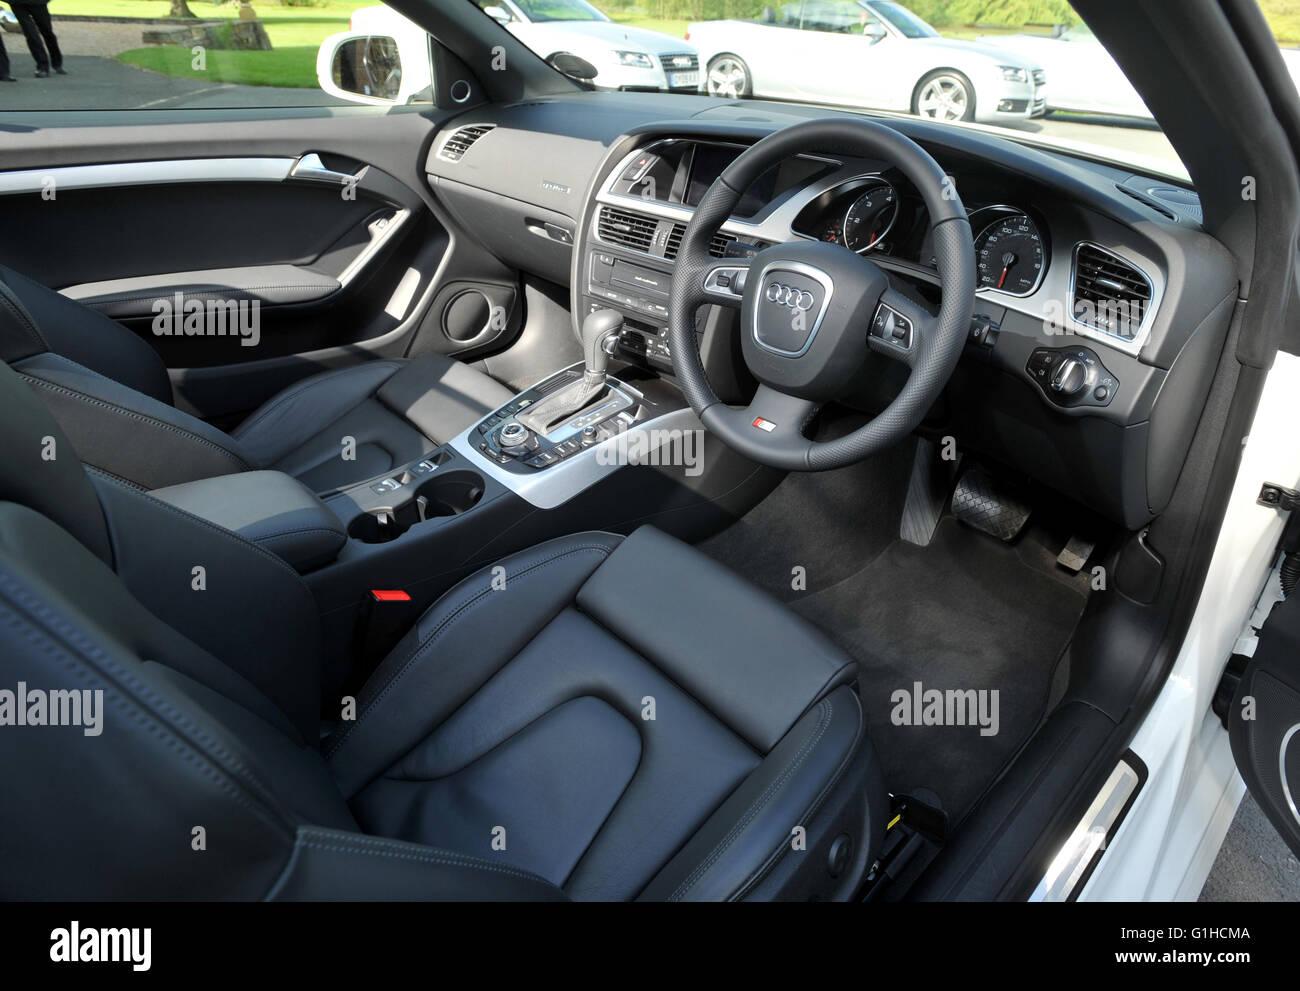 2009 Audi A5 Convertible V6 Tdi Diesel Interior Stock Photo Alamy